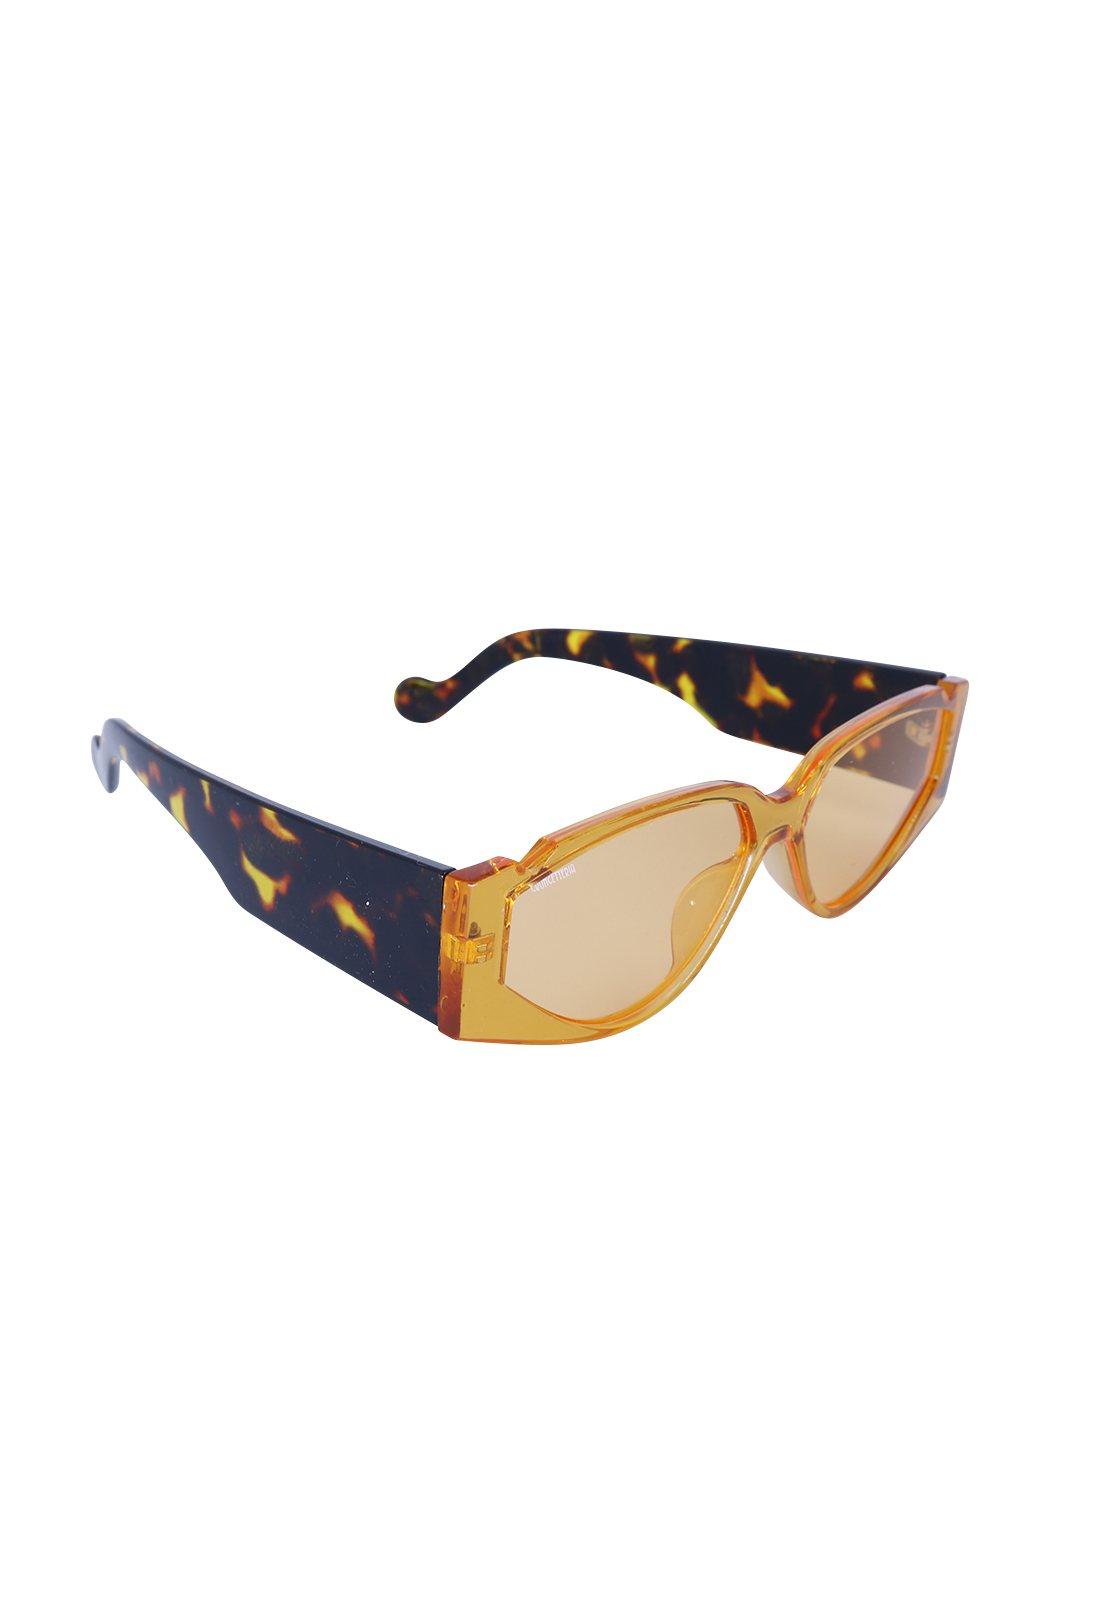 Óculos de Sol Grungetteria Jungle Laranja